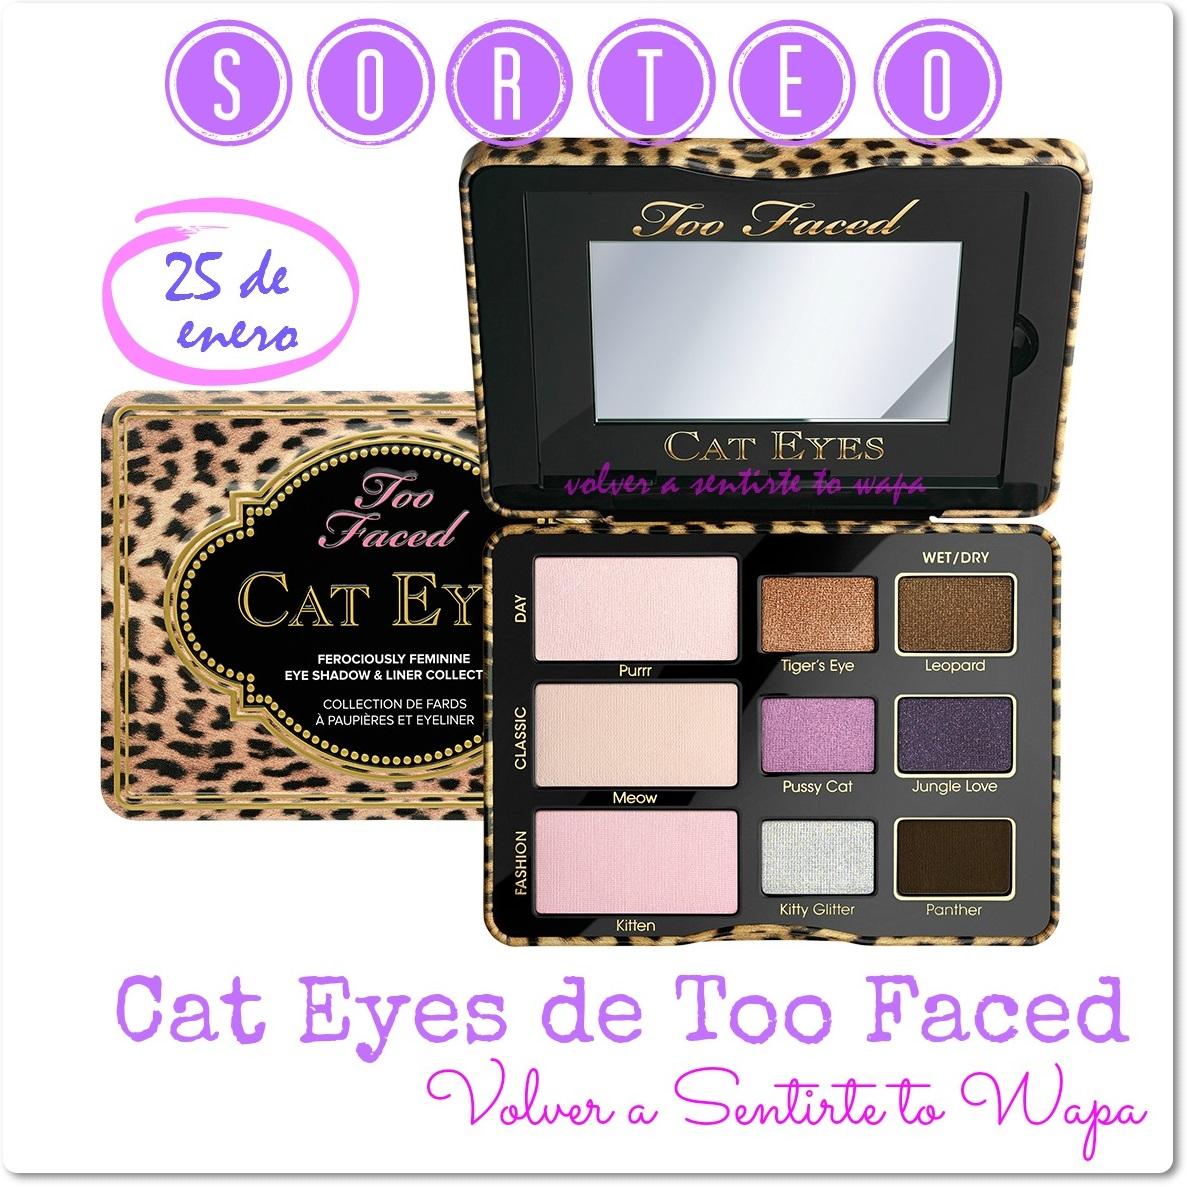 SORTEO TOO FACED - Paleta Cat Eyes - Volver a Sentirte to Wapa